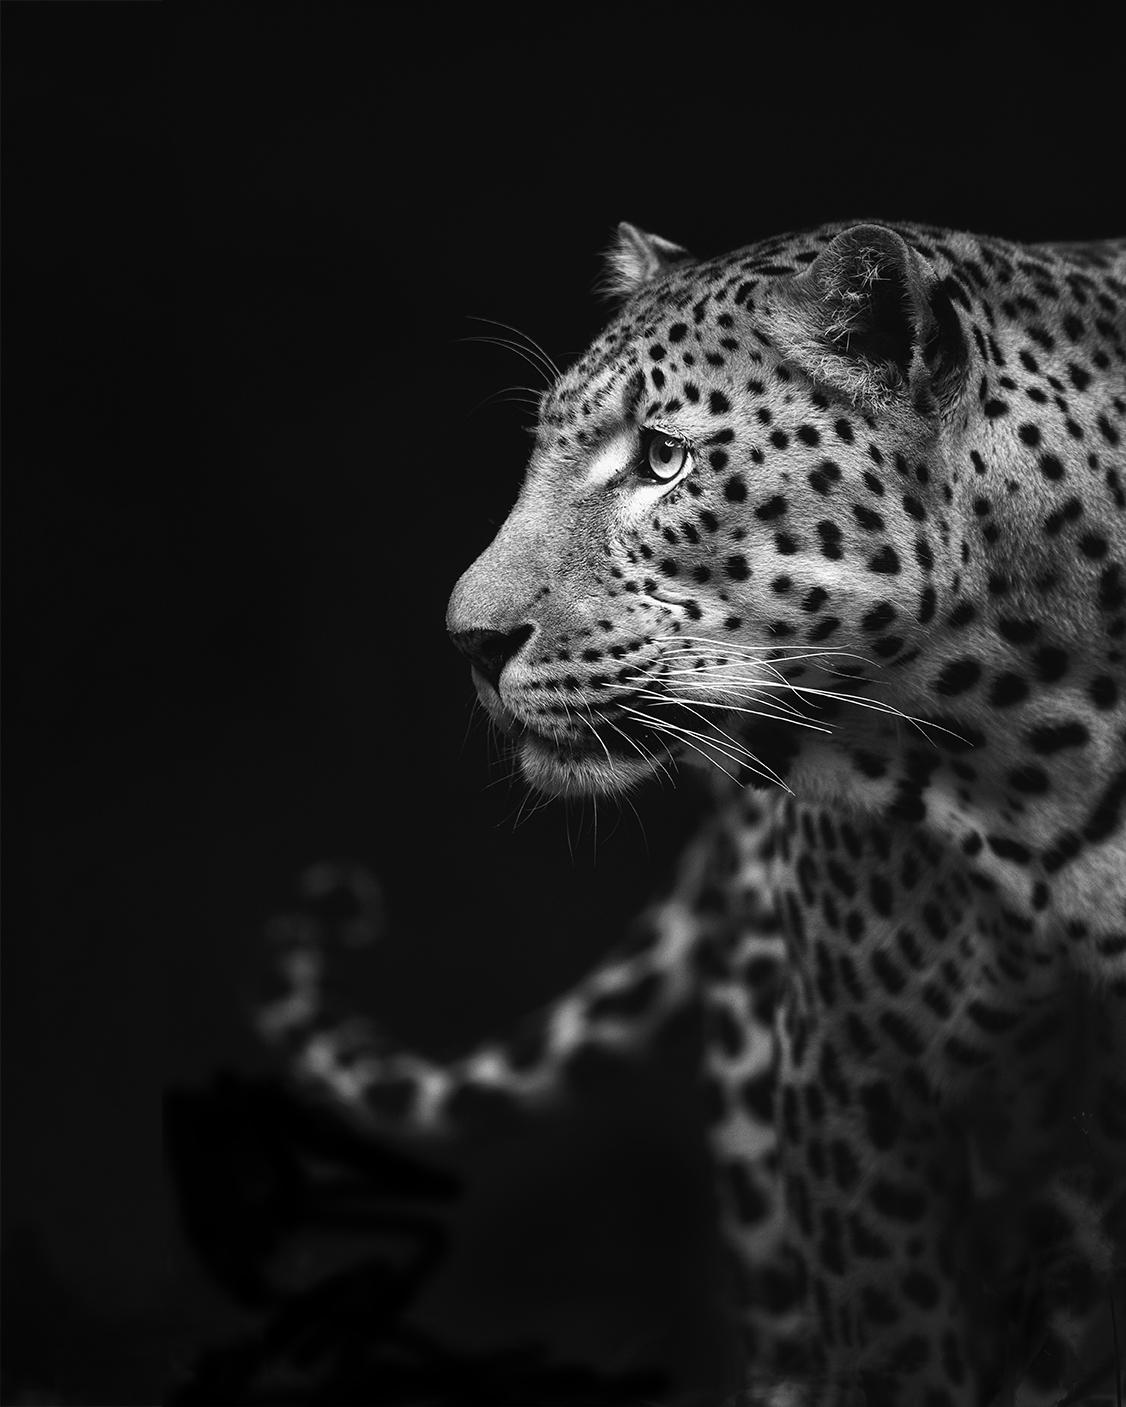 Leopard in black andwhite